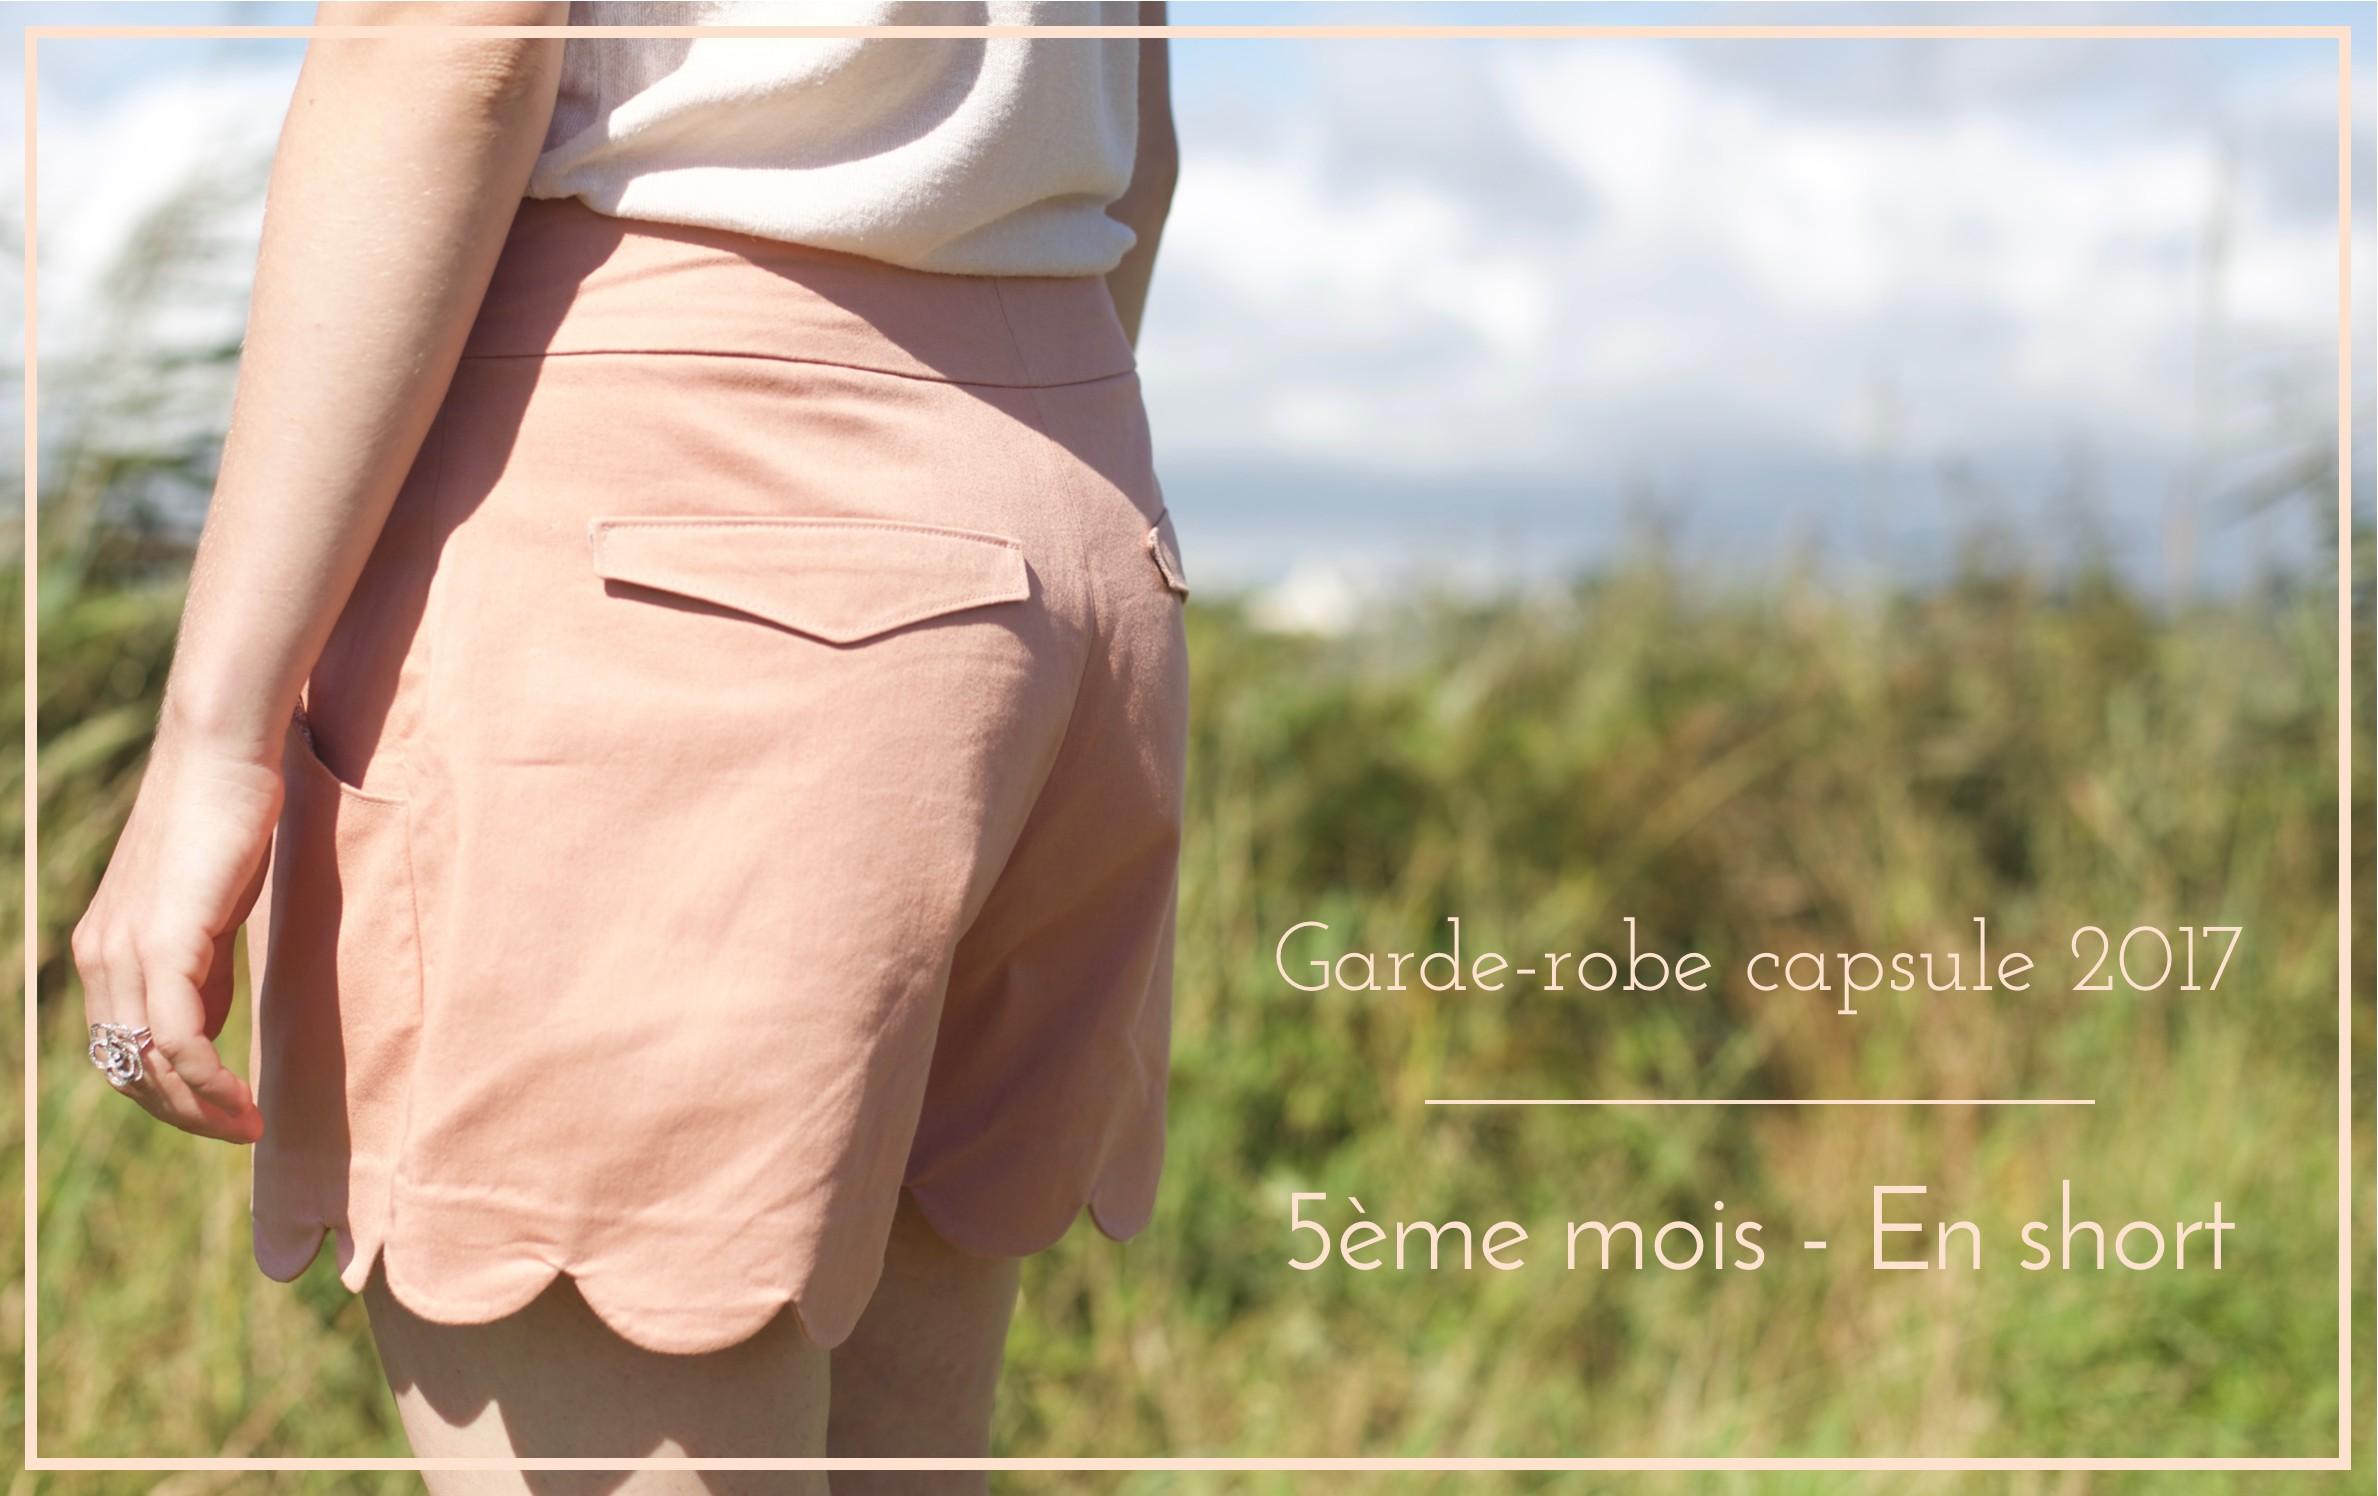 Garde robe capsule 2017 - Short chataigne - Deer and Doe - La muse au placard